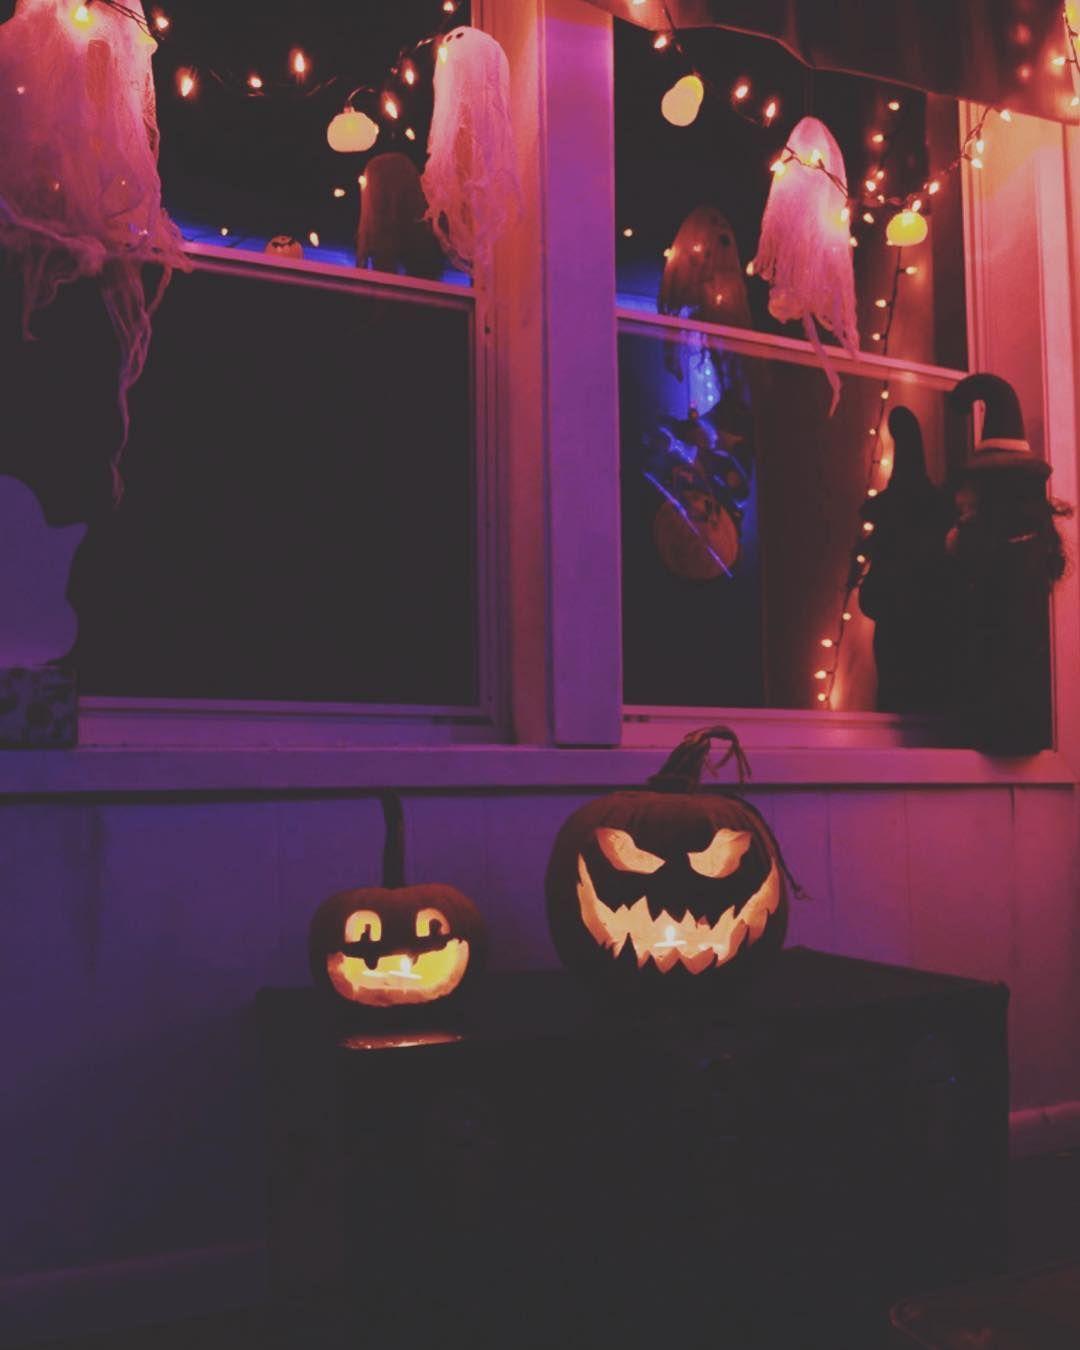 98 Days Halloweendays Halloween House Haunted Pumpkinpatch Candlelight Cozy Fall Au Halloween Wallpaper Halloween Decorations Happy Halloween